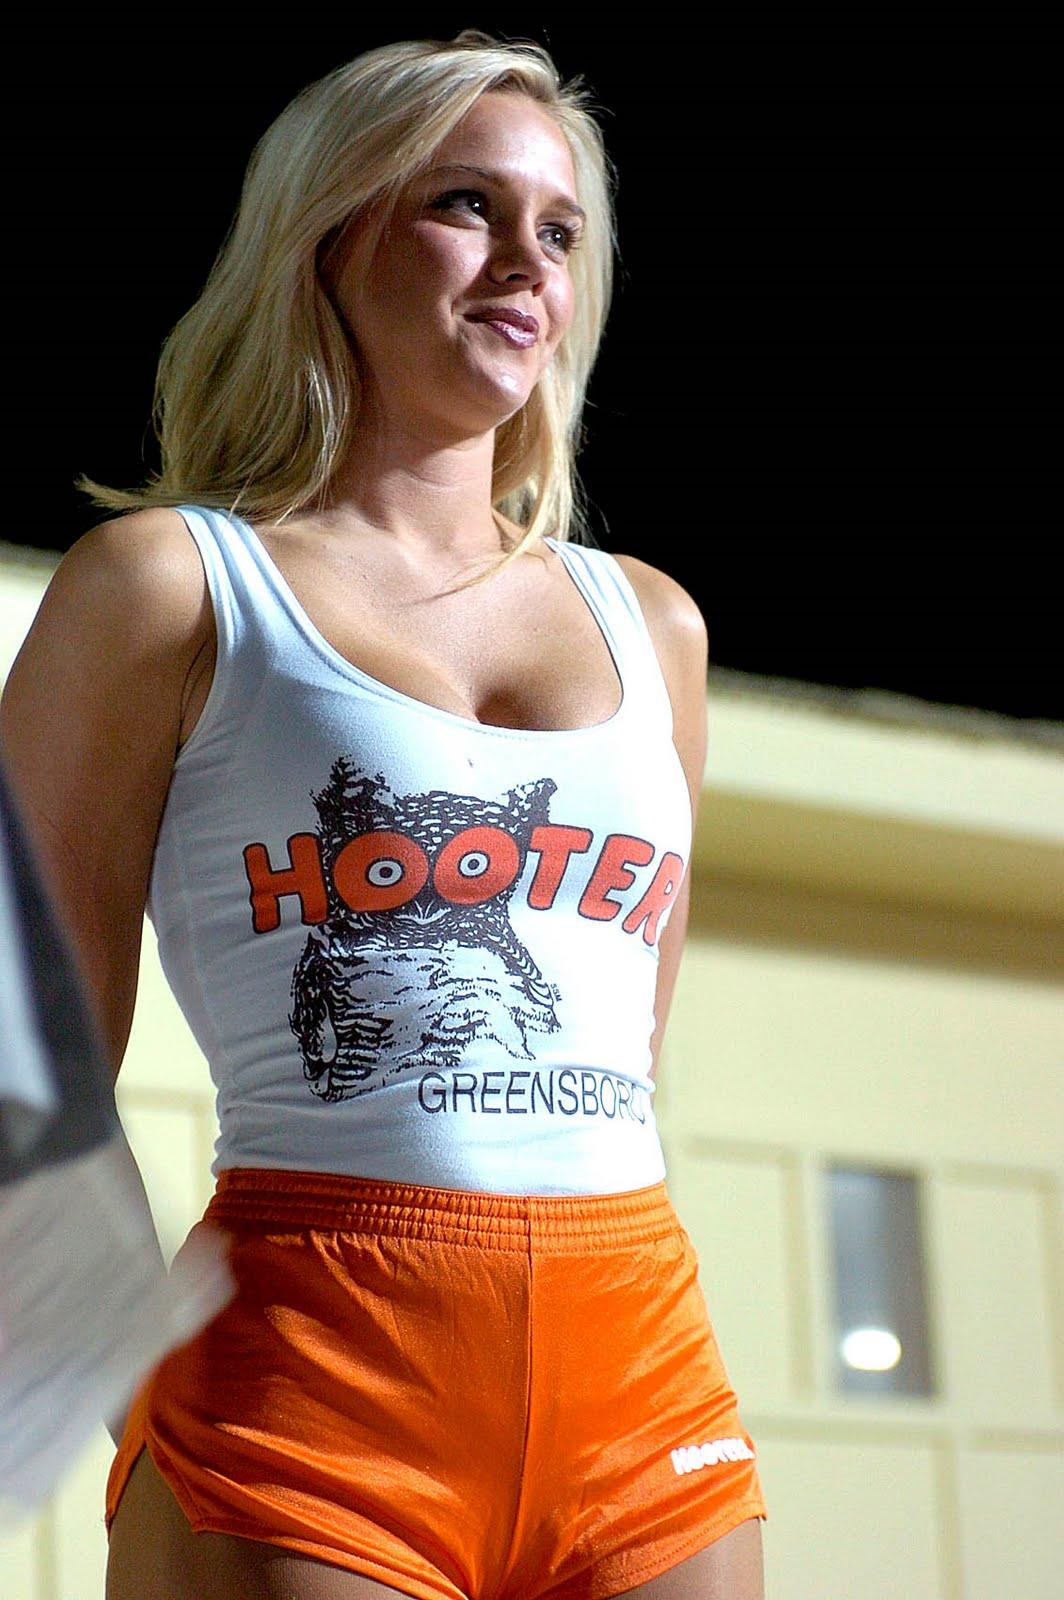 Hooters Hooters Greenboro_OEF Jun04_2004